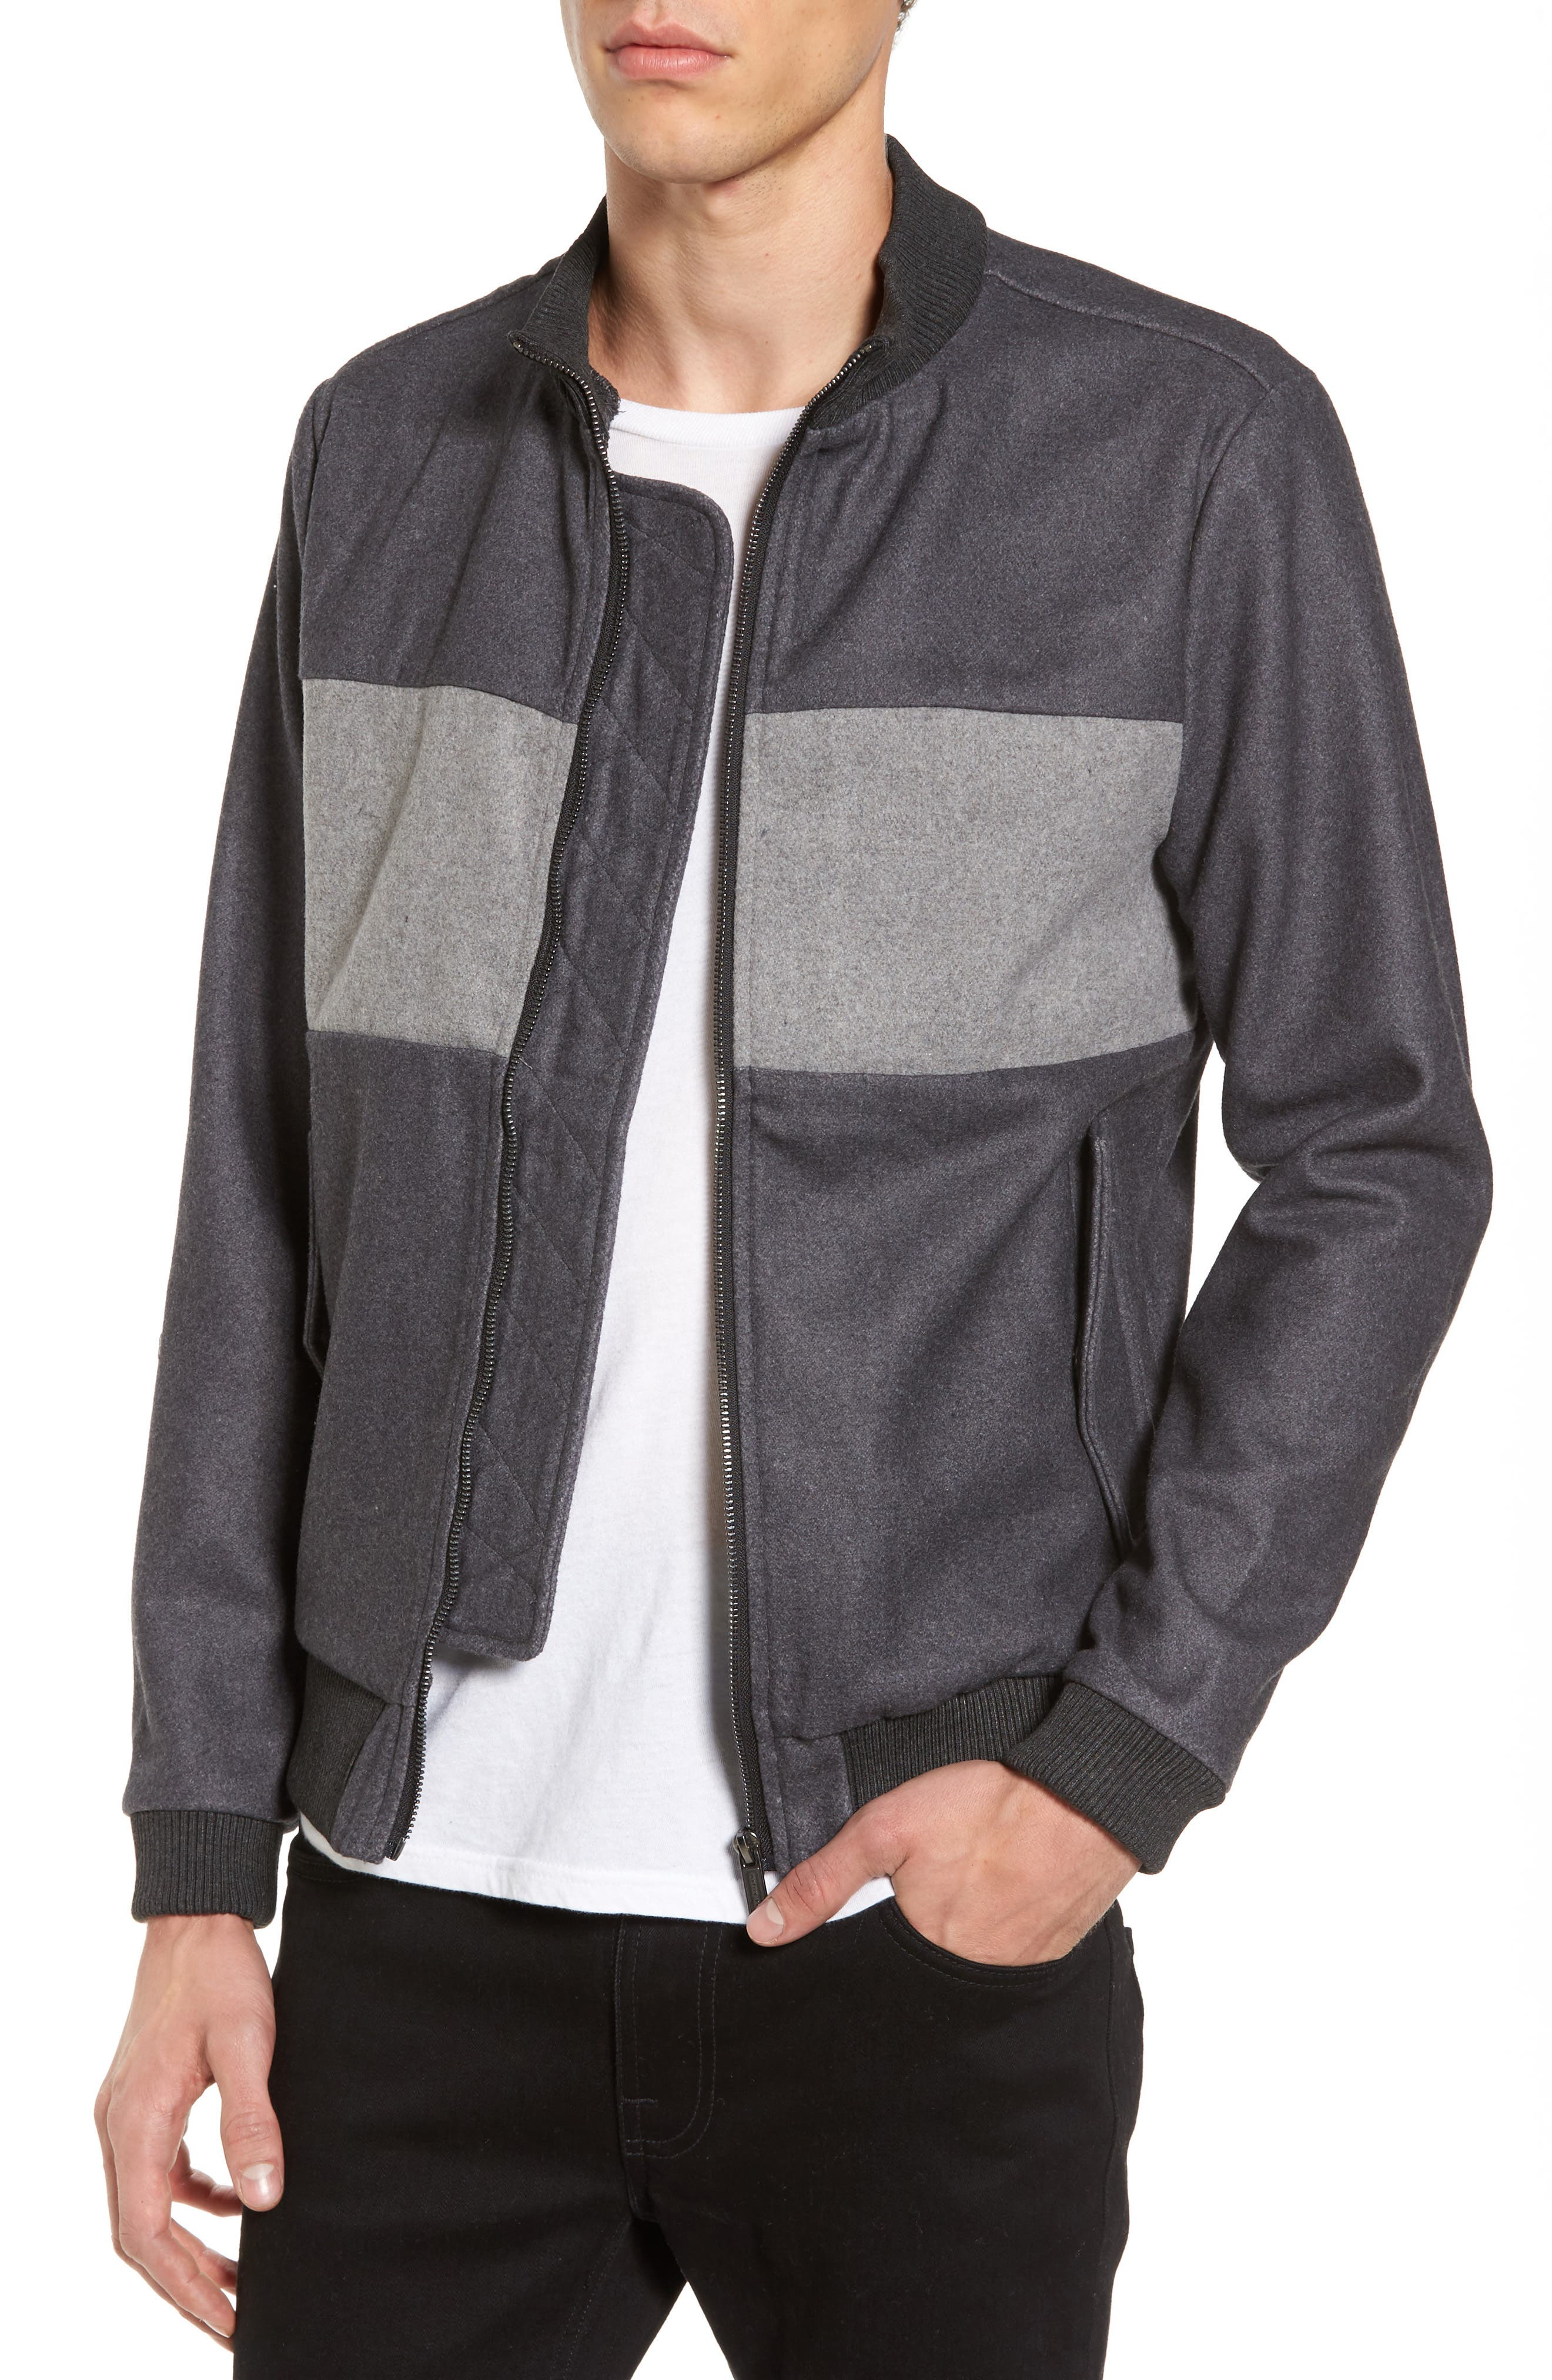 Cityscape Jacket,                         Main,                         color, 020